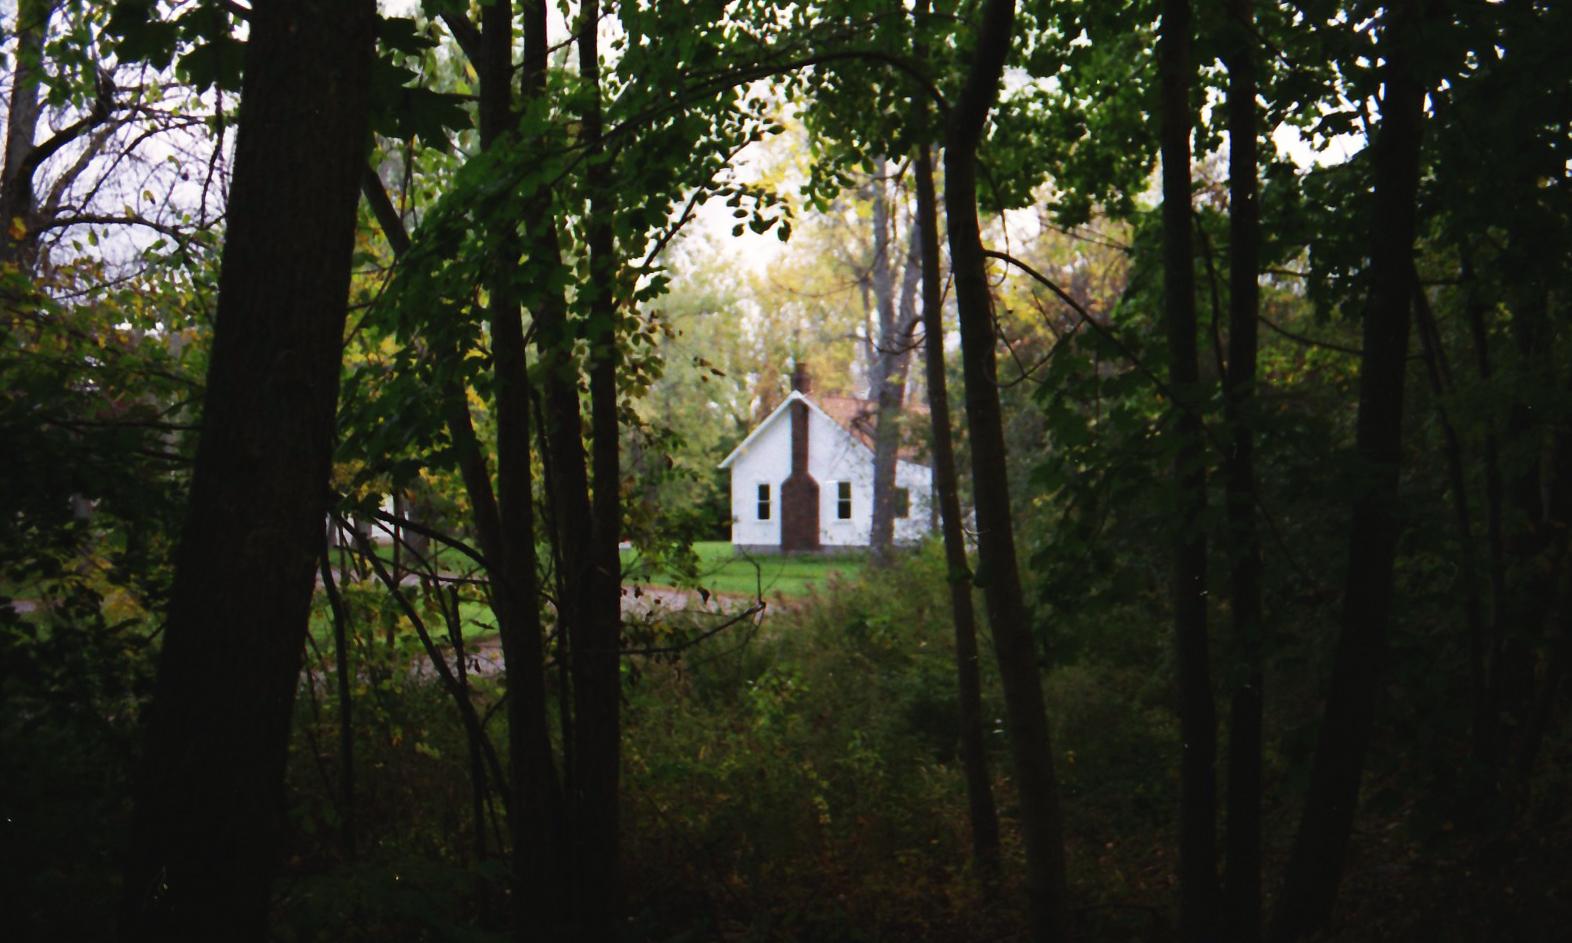 houseinwoods.jpg